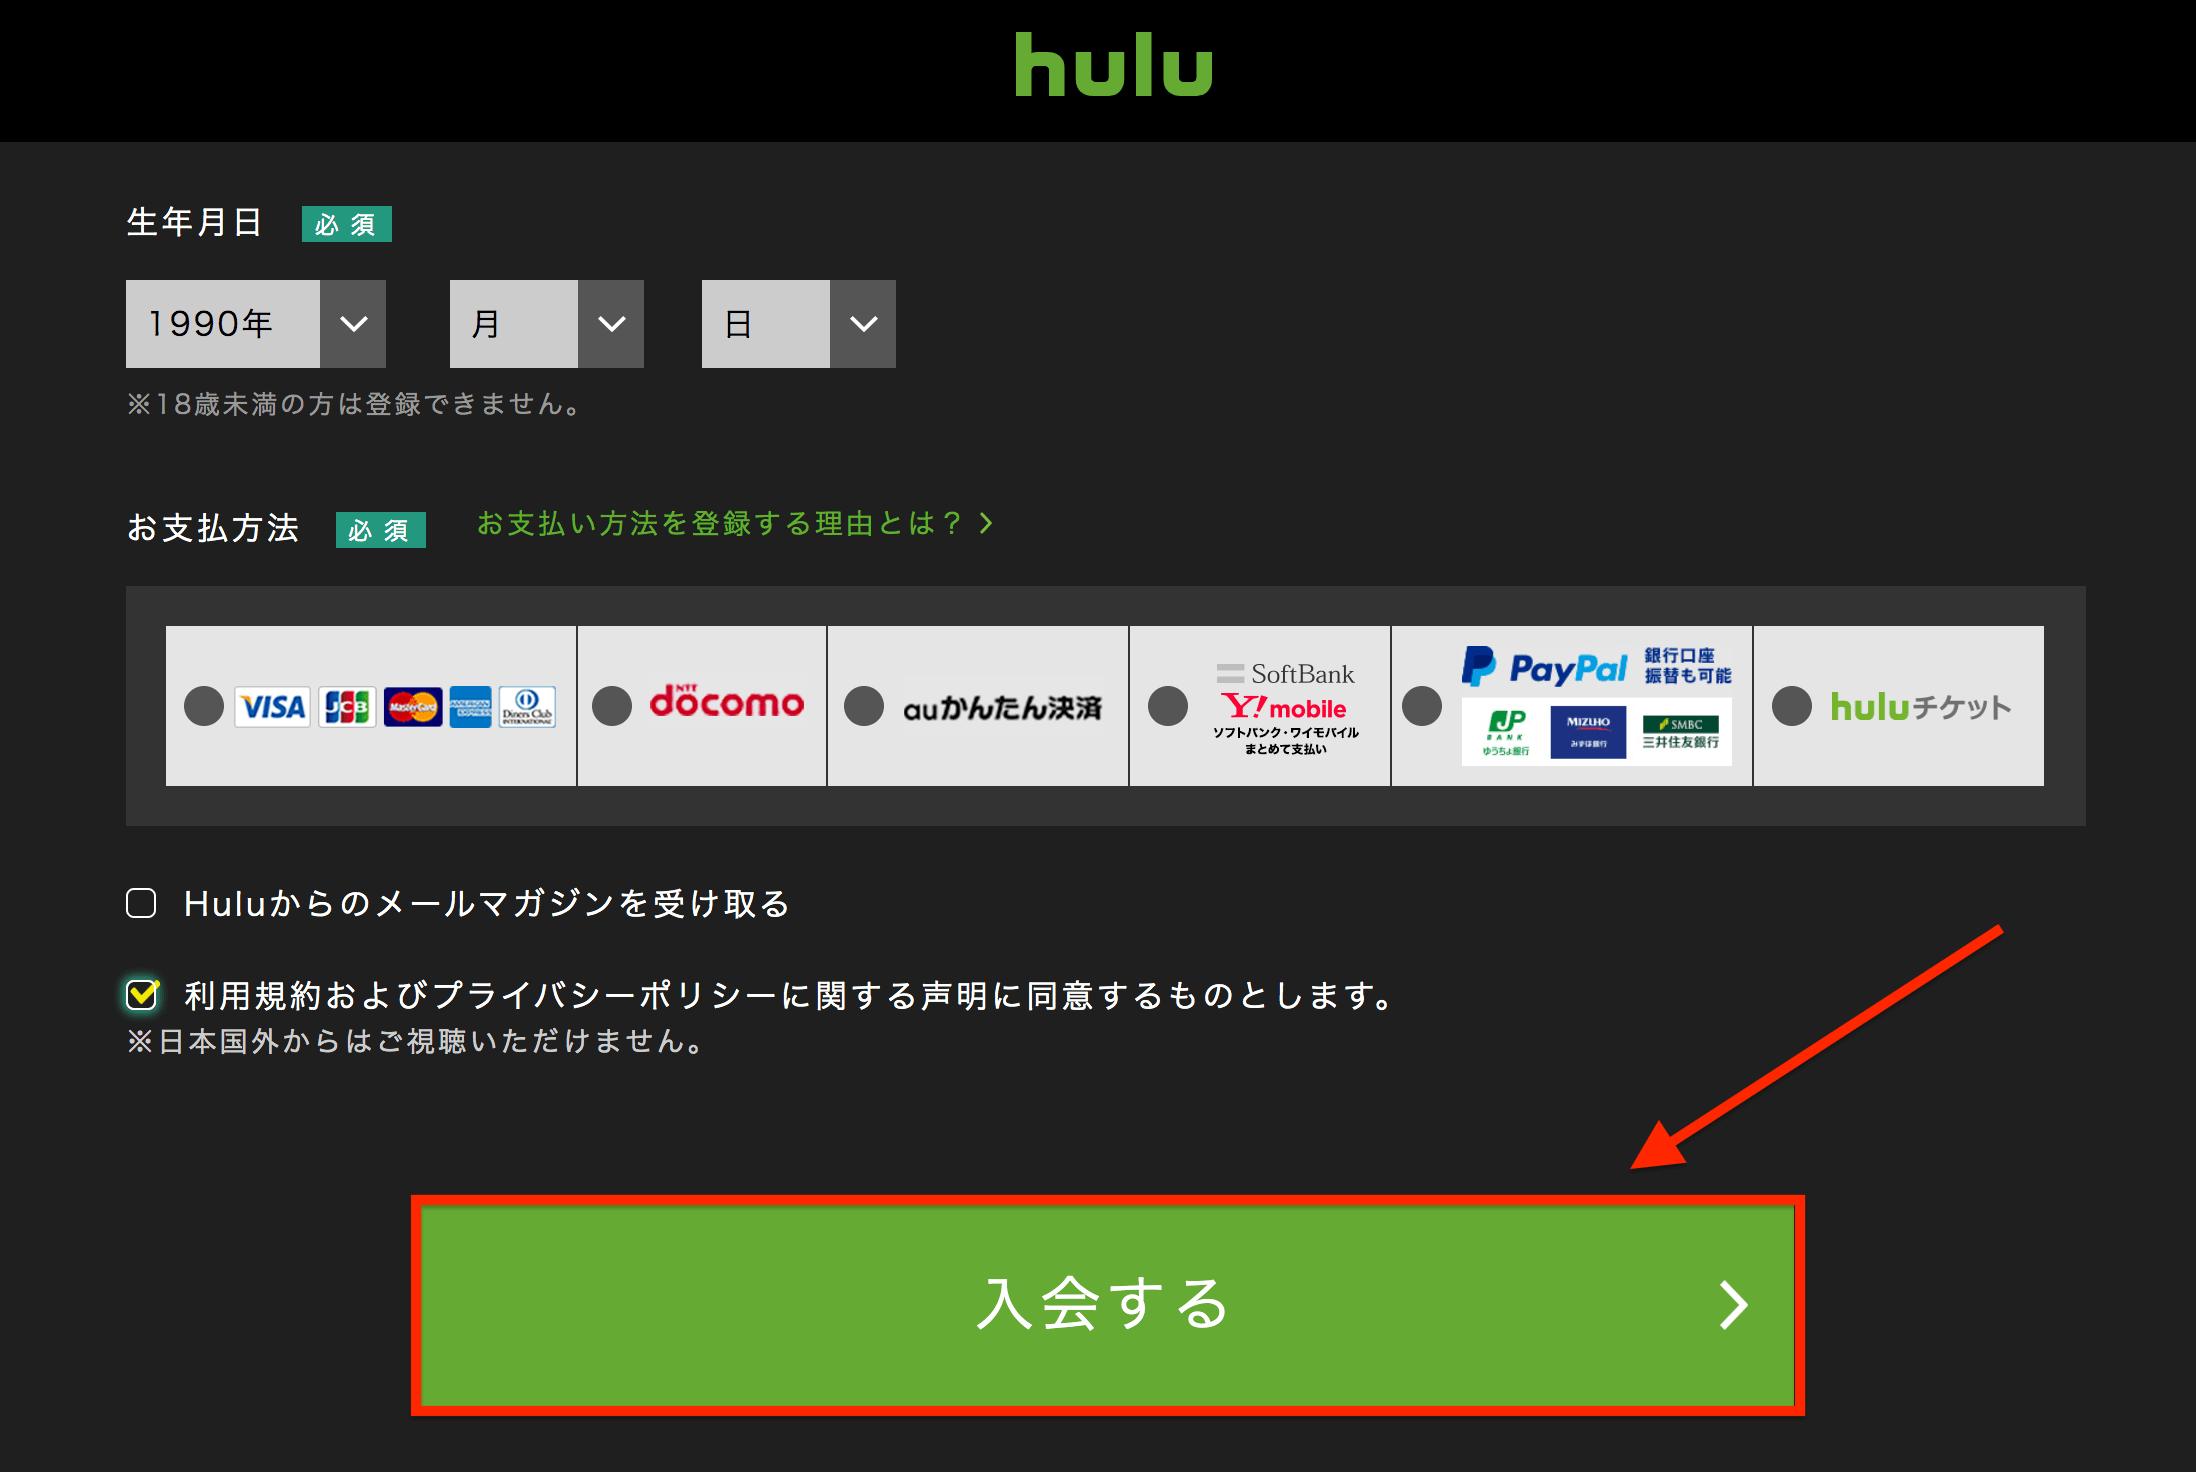 Hulu_無料トライアル申し込み方法2